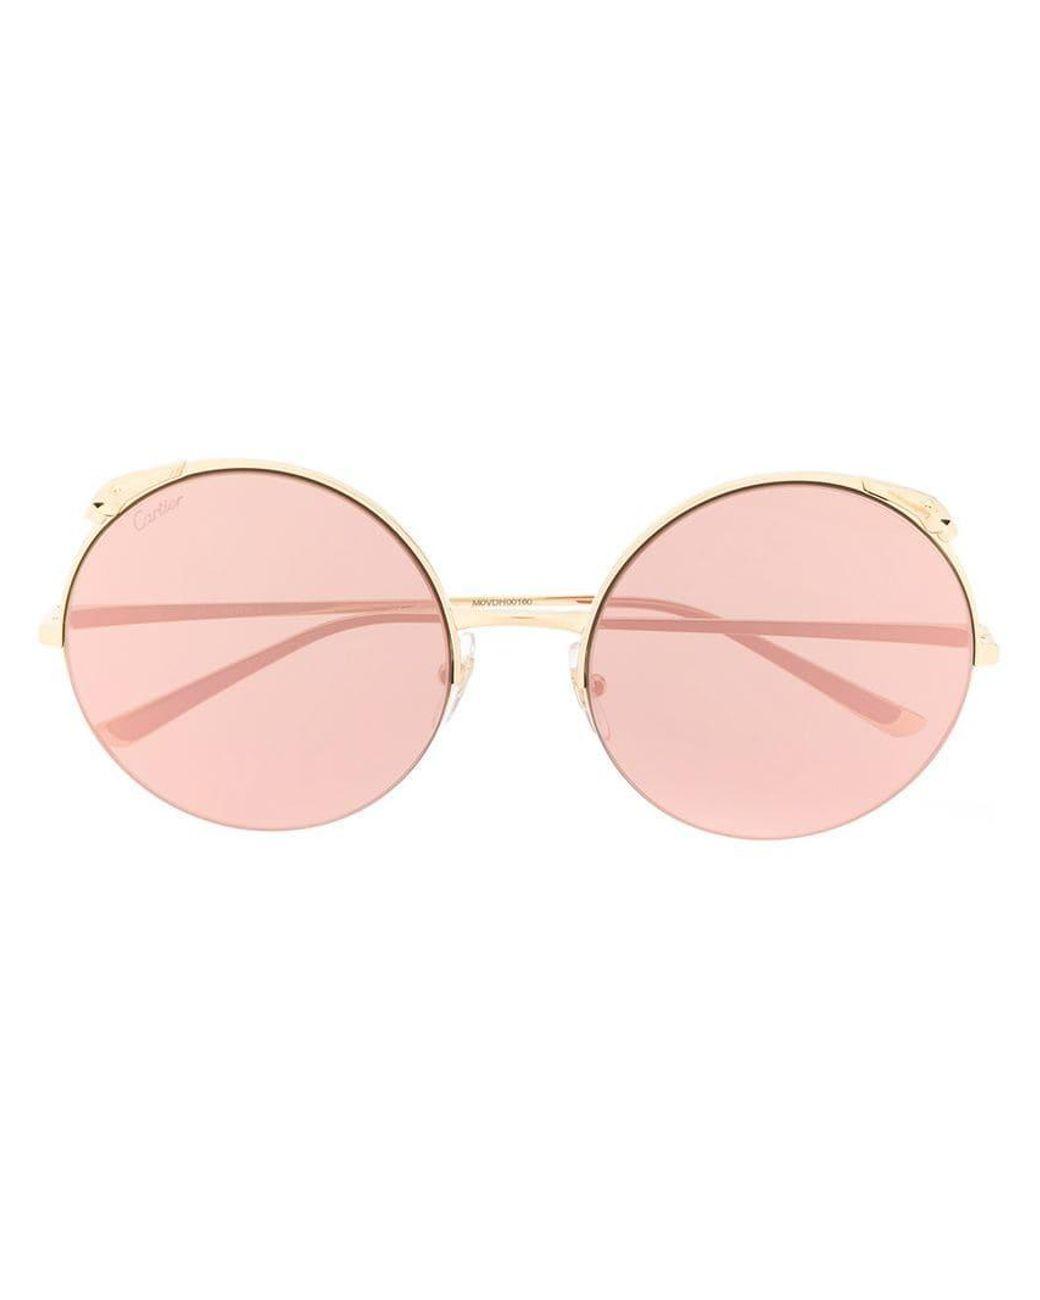 316ea0fbf4 Cartier Oversized Round Sunglasses in Metallic - Lyst